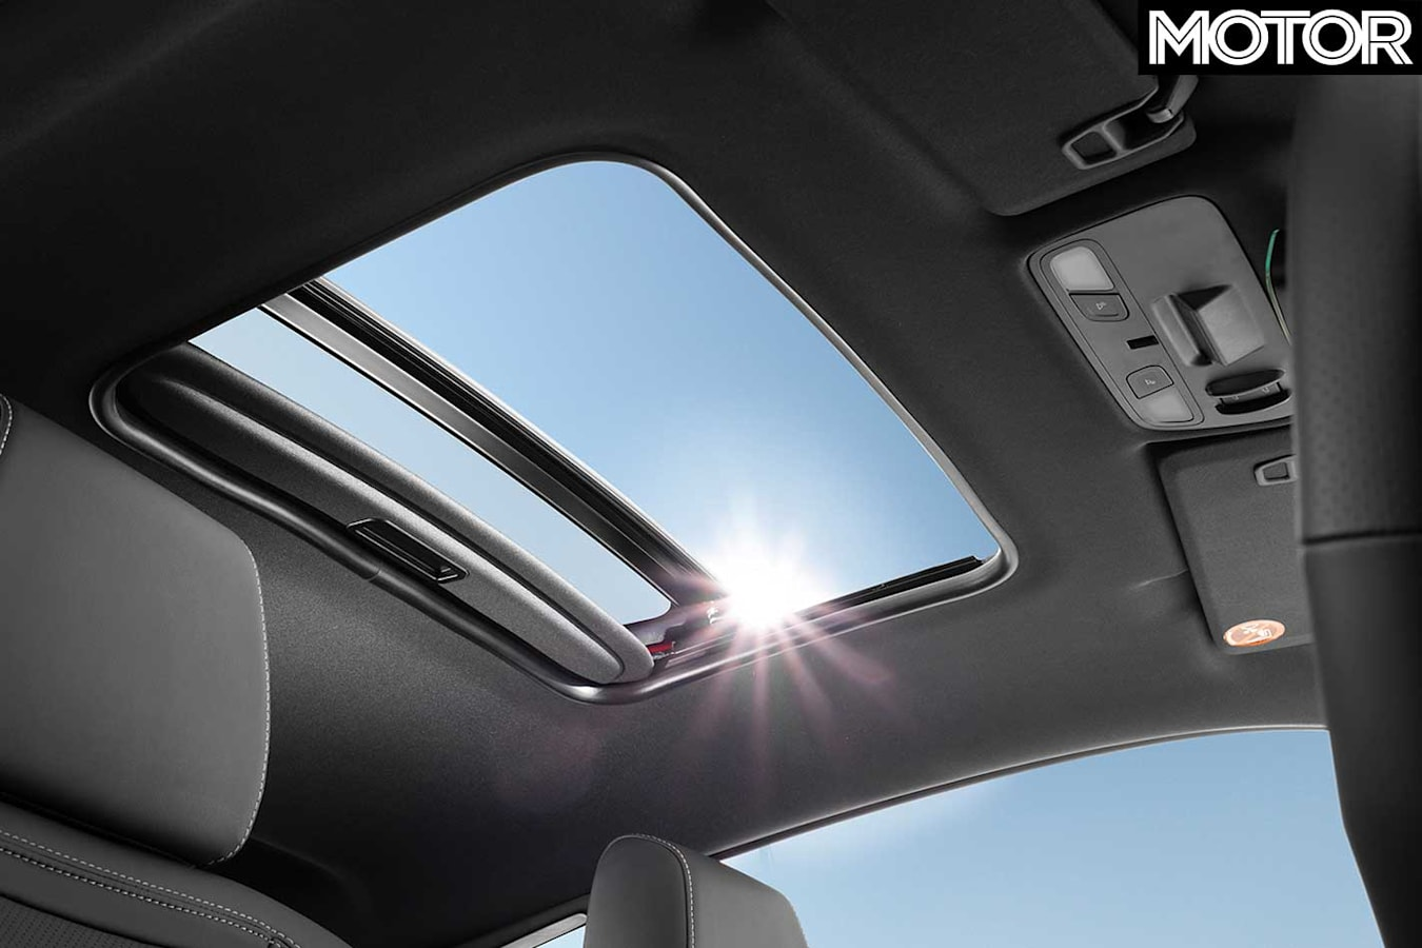 2018 HSV Chevrolet Camaro Need To Know Sunroof Jpg